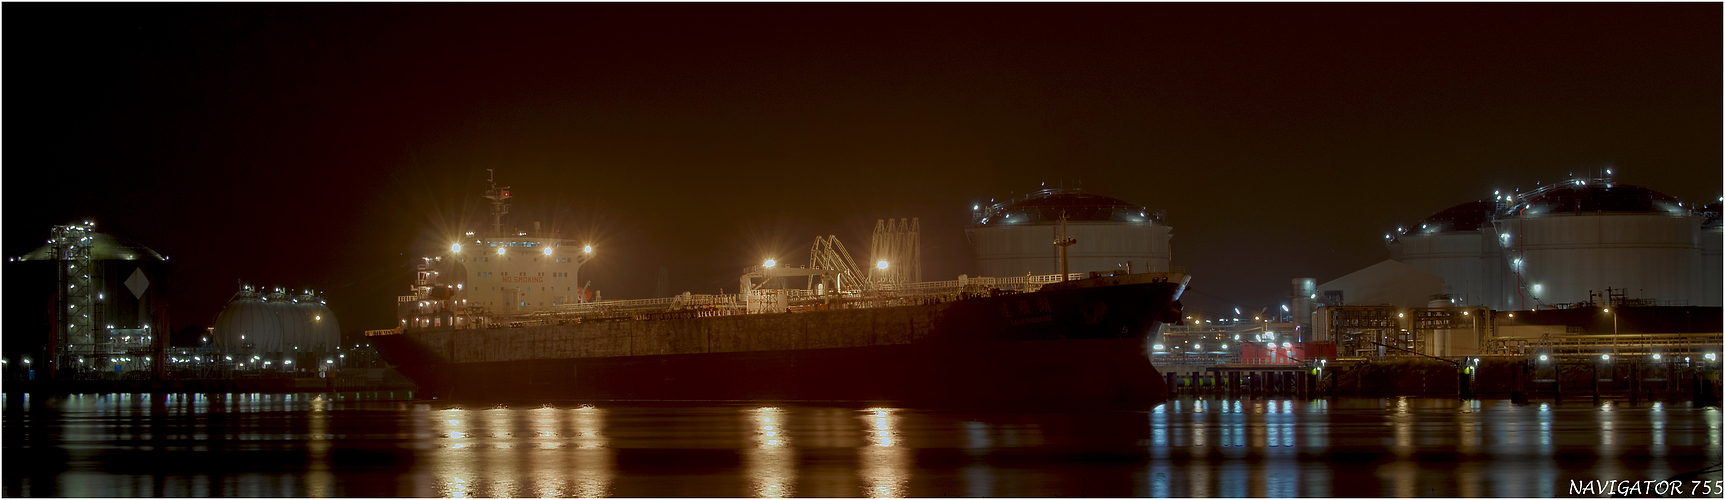 Petroleumhaven N°5 / Rotterdam